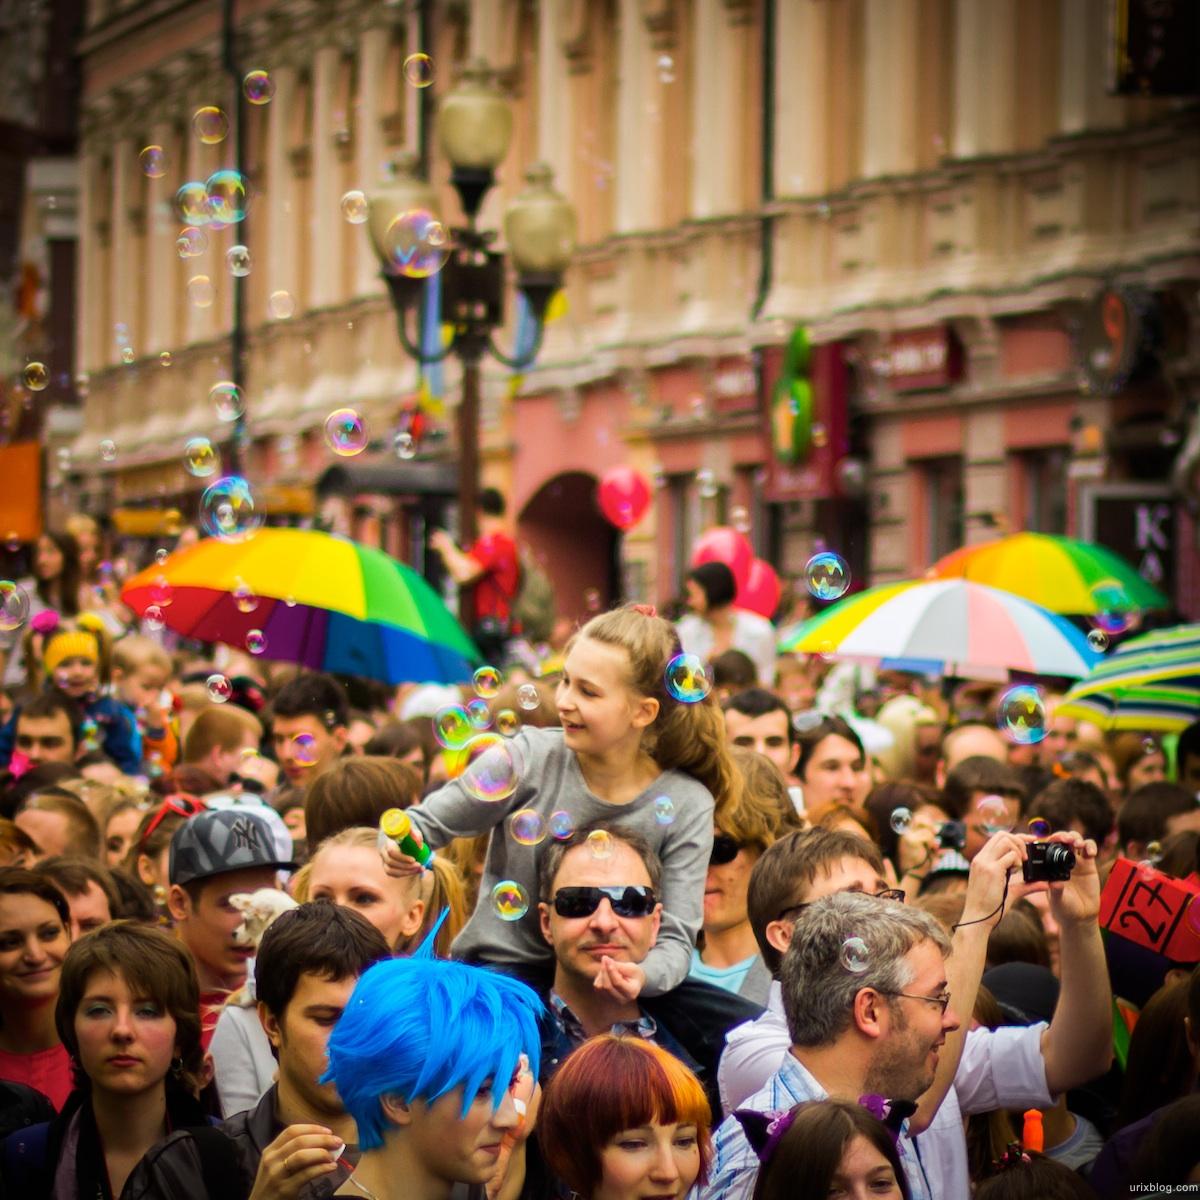 2012 Москва Дримфлэшь Дримфлешь Dreamflash